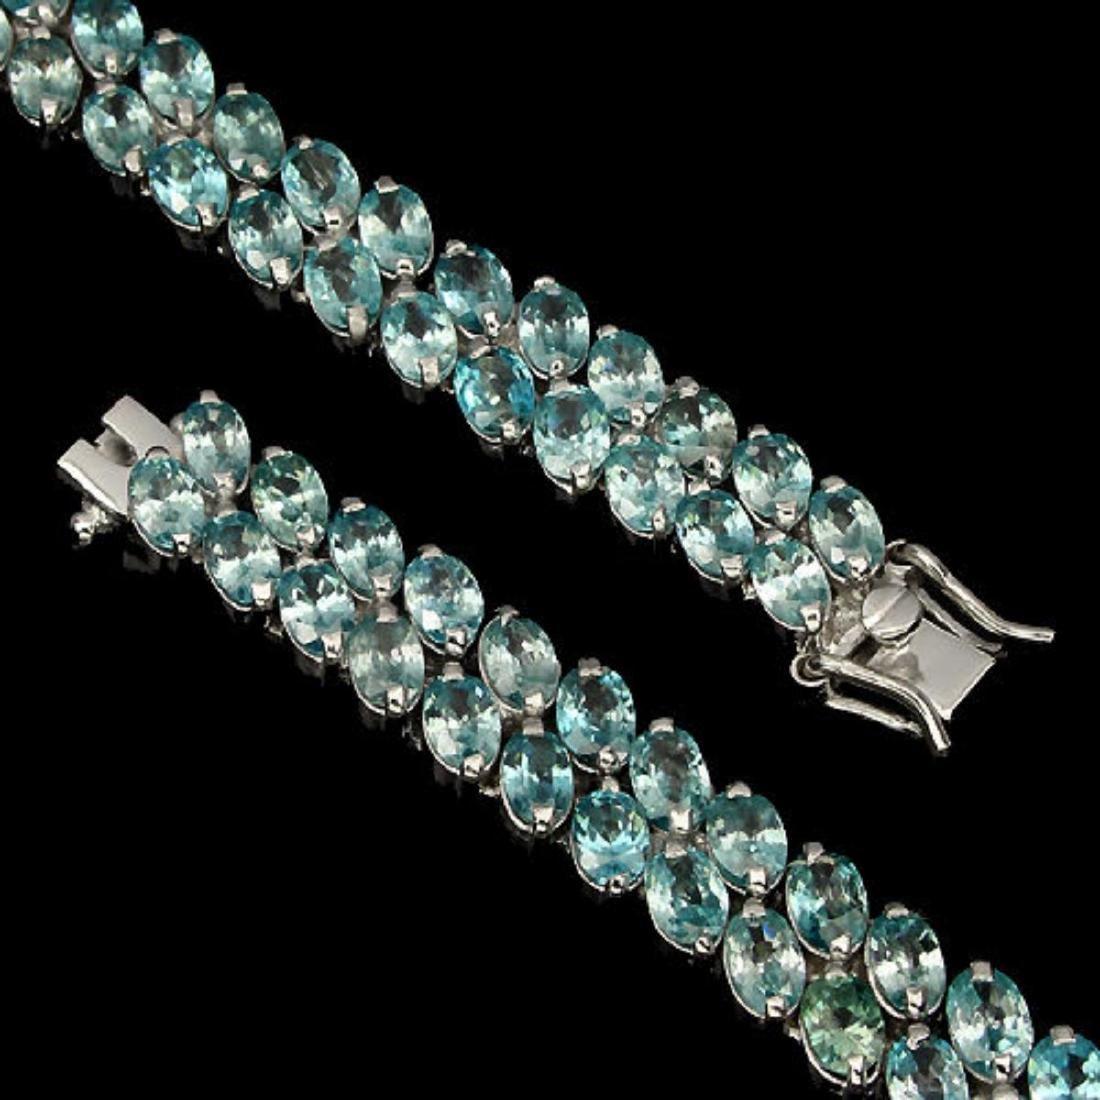 Nautral Combodian Zircon 146 Carats Bracelet - 2